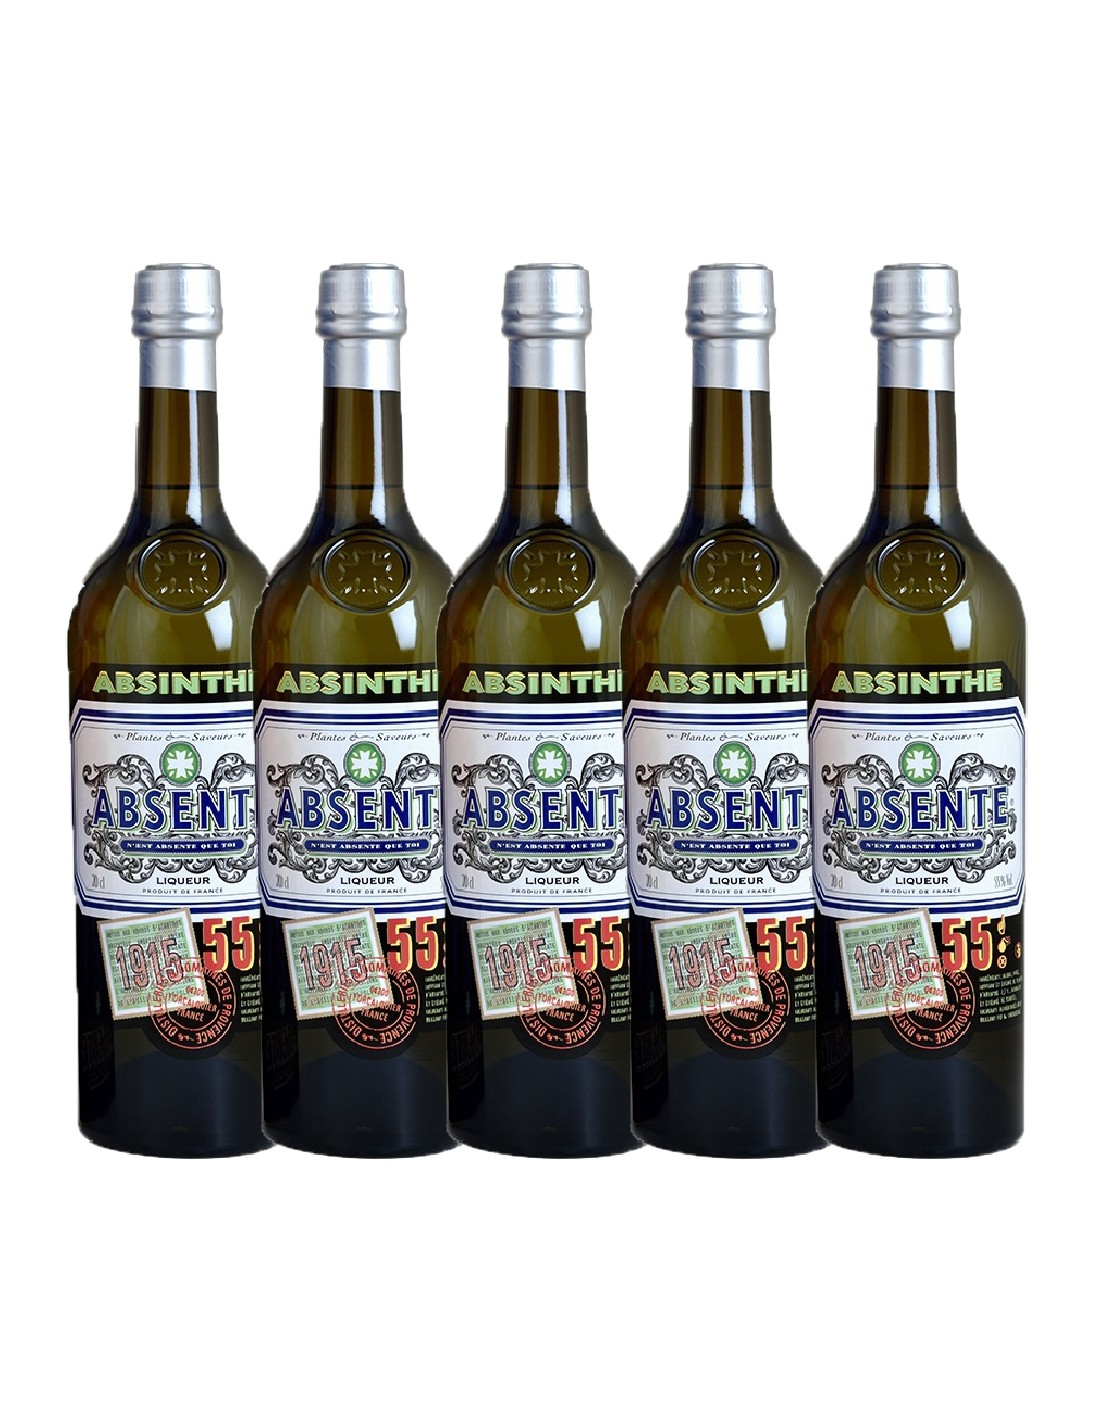 Pachet 5 sticle Absint Absente, 55% alc., 0.7L